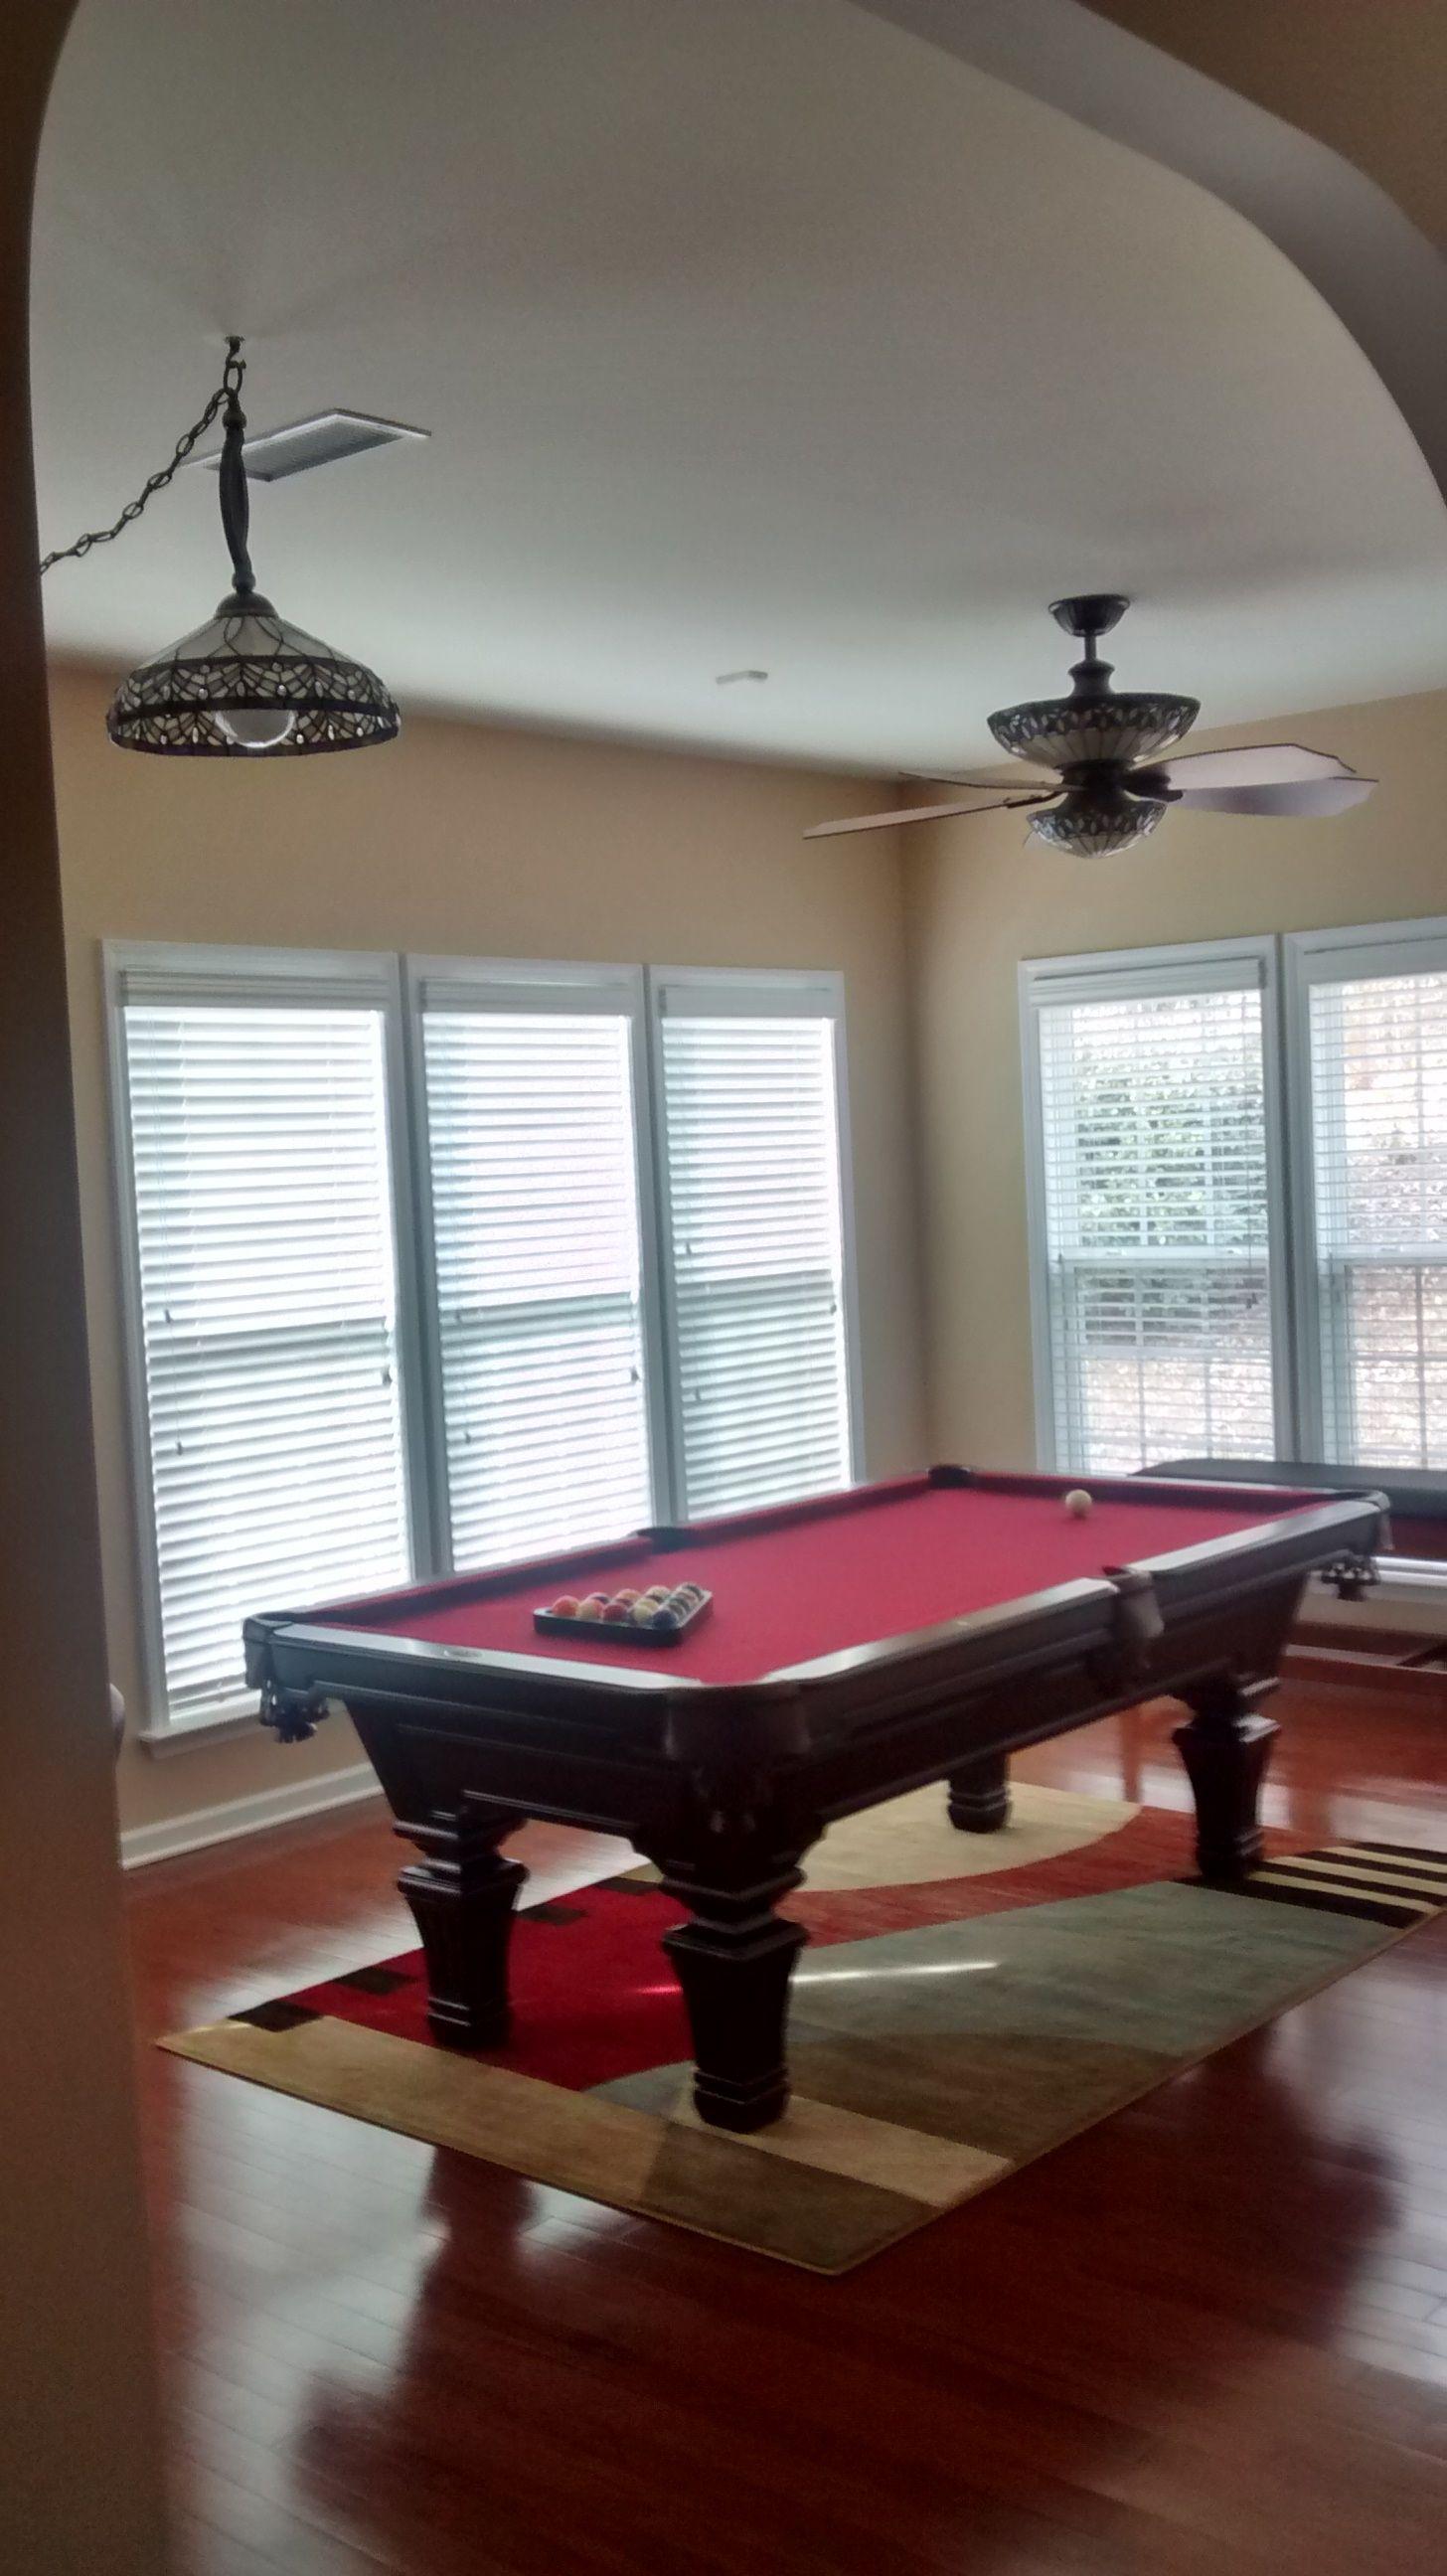 Atlantic Spas And Billiards Raleigh Nc Trend Home Design - Olhausen hampton pool table